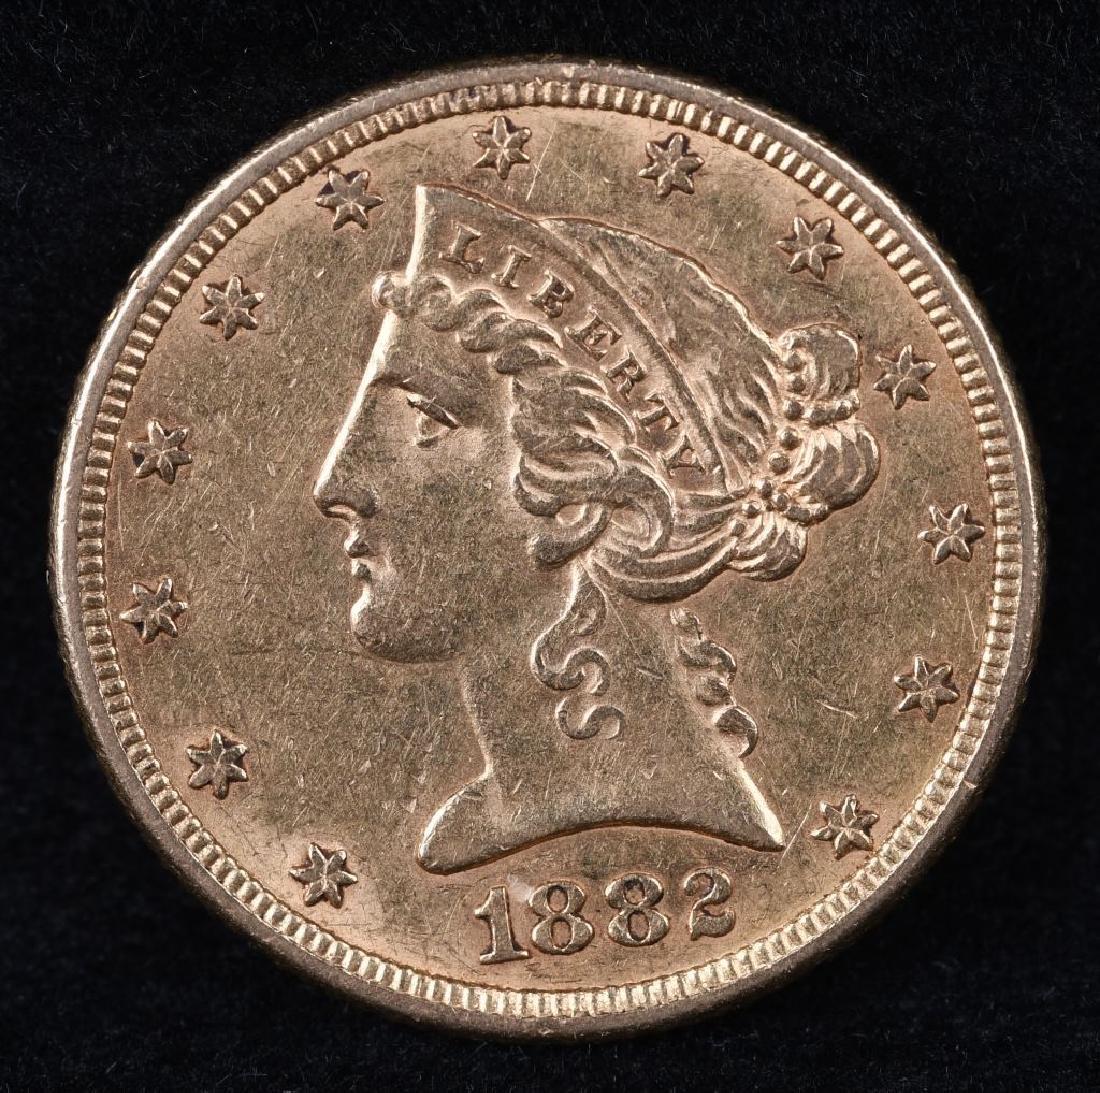 1882 $5 US GOLD LIBERTY